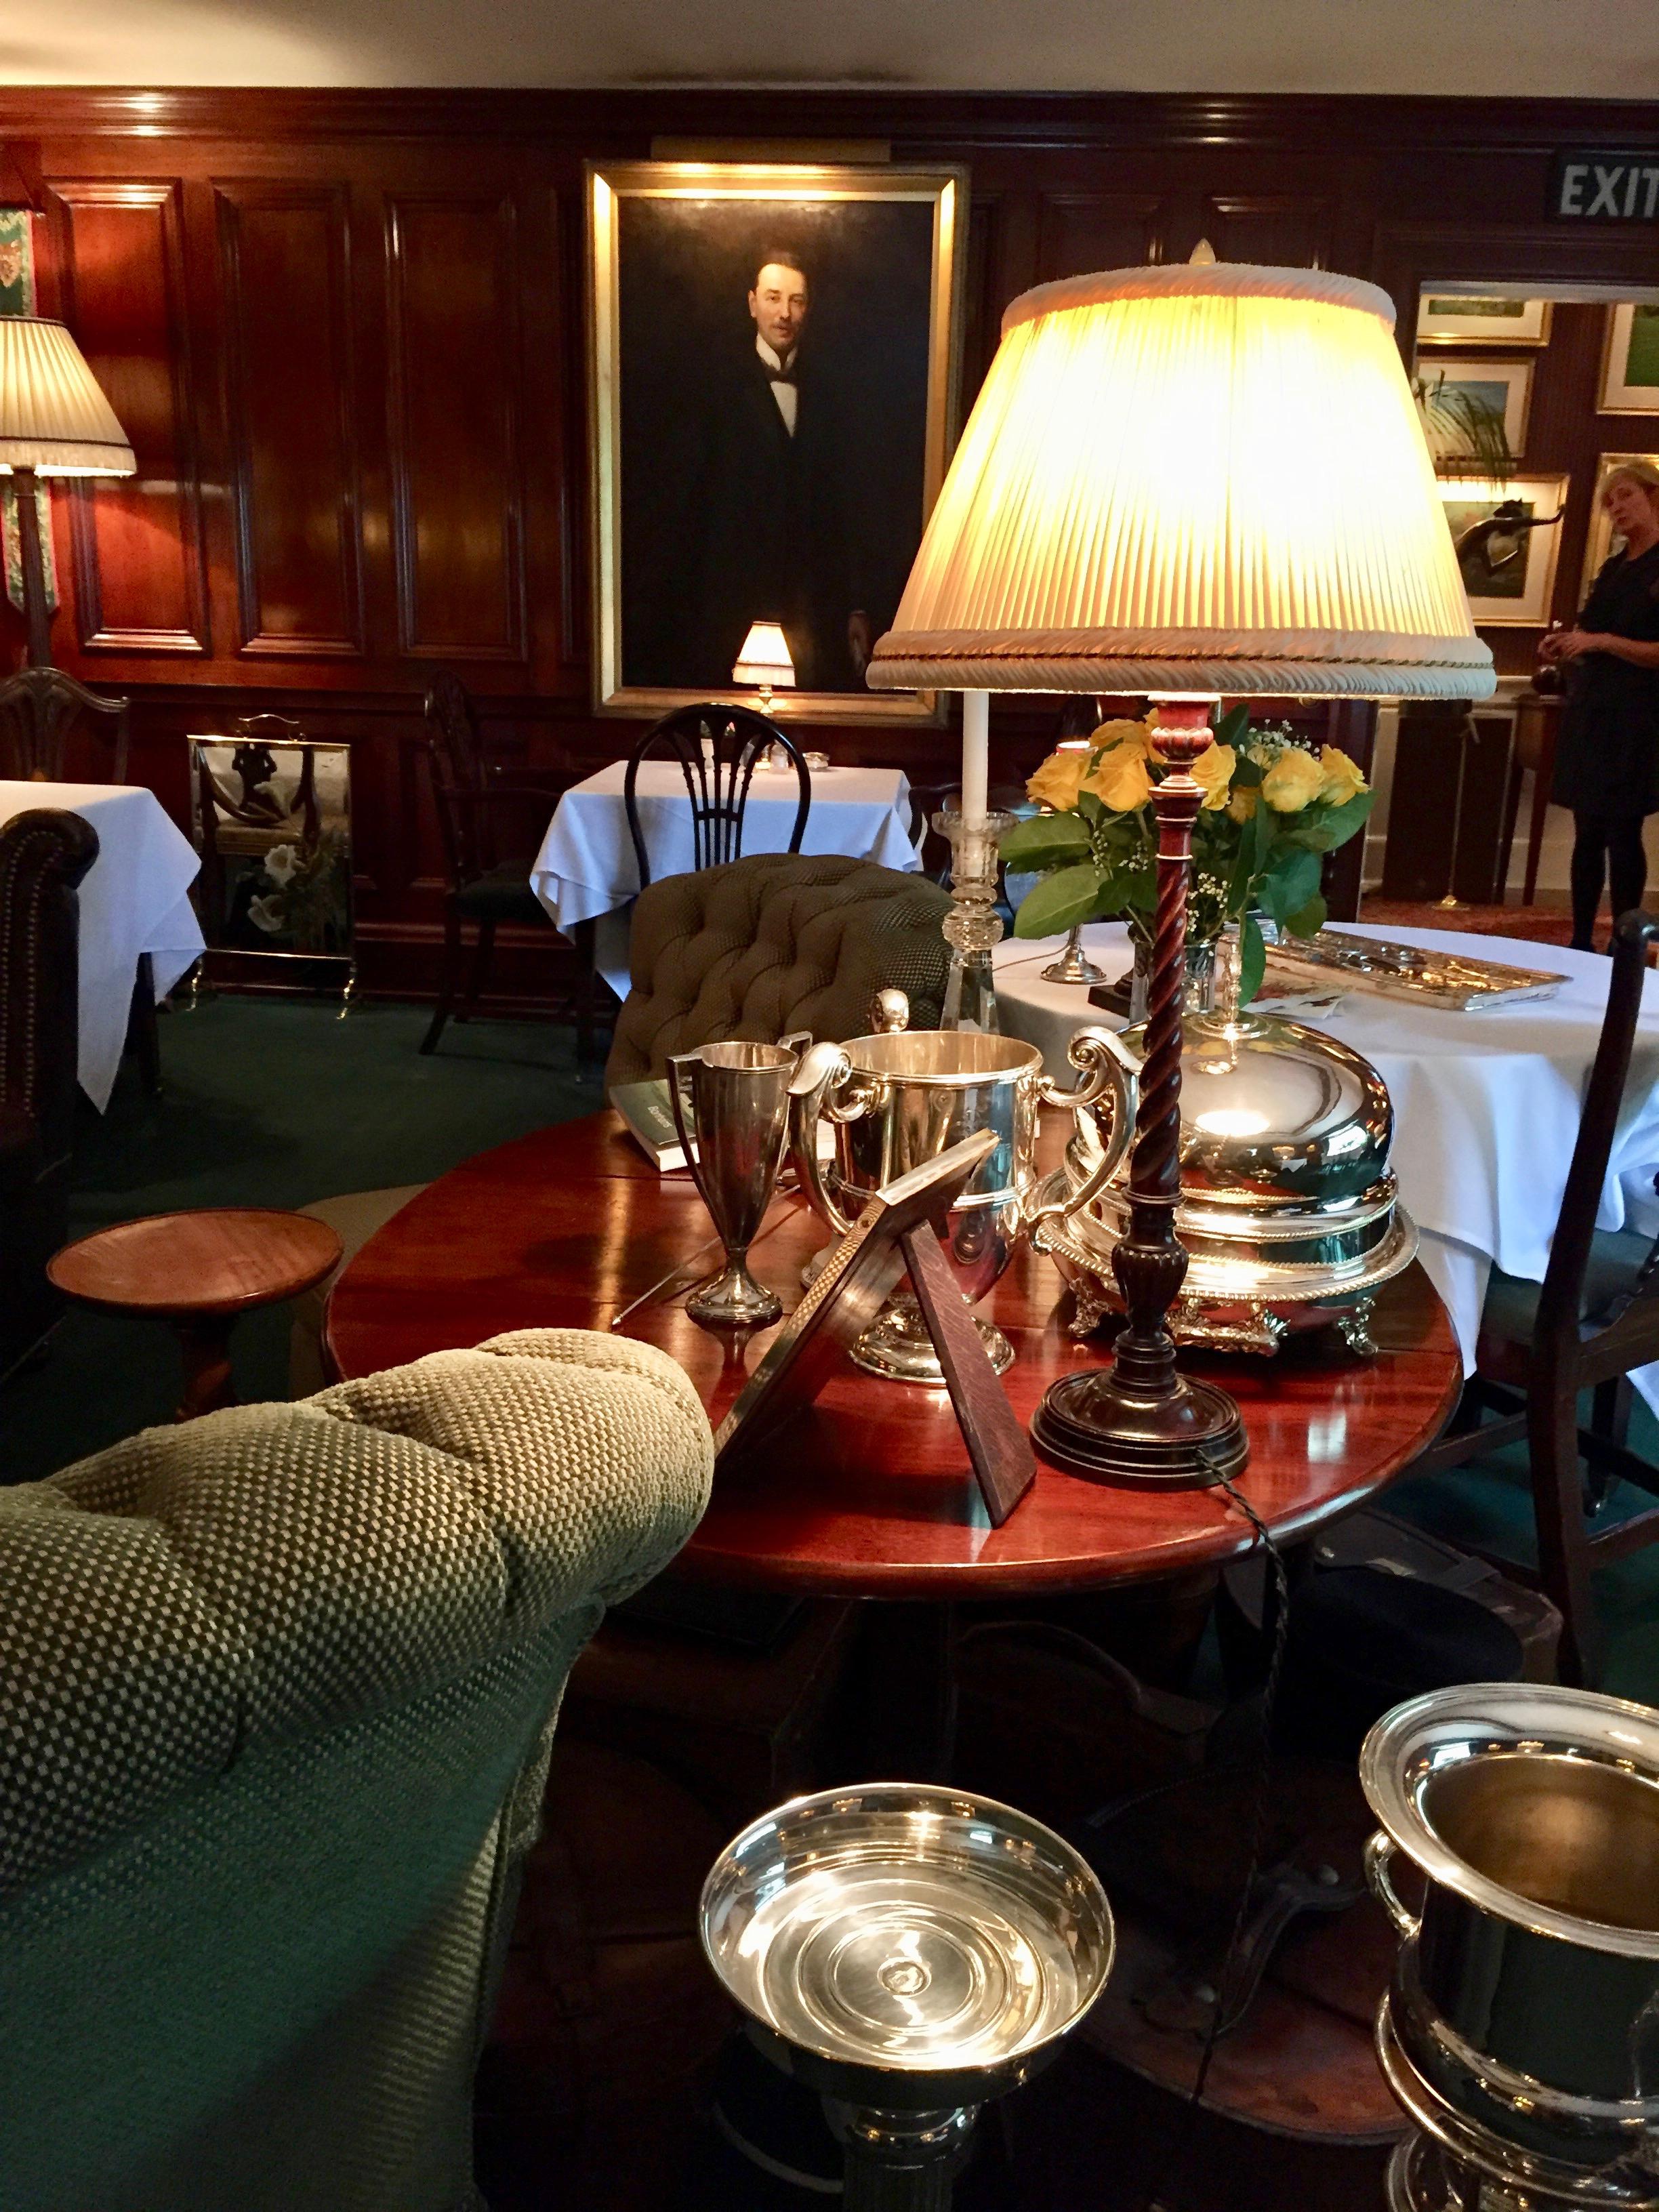 New England Fine Living visits the Charlotte Inn on Martha's Vineyard